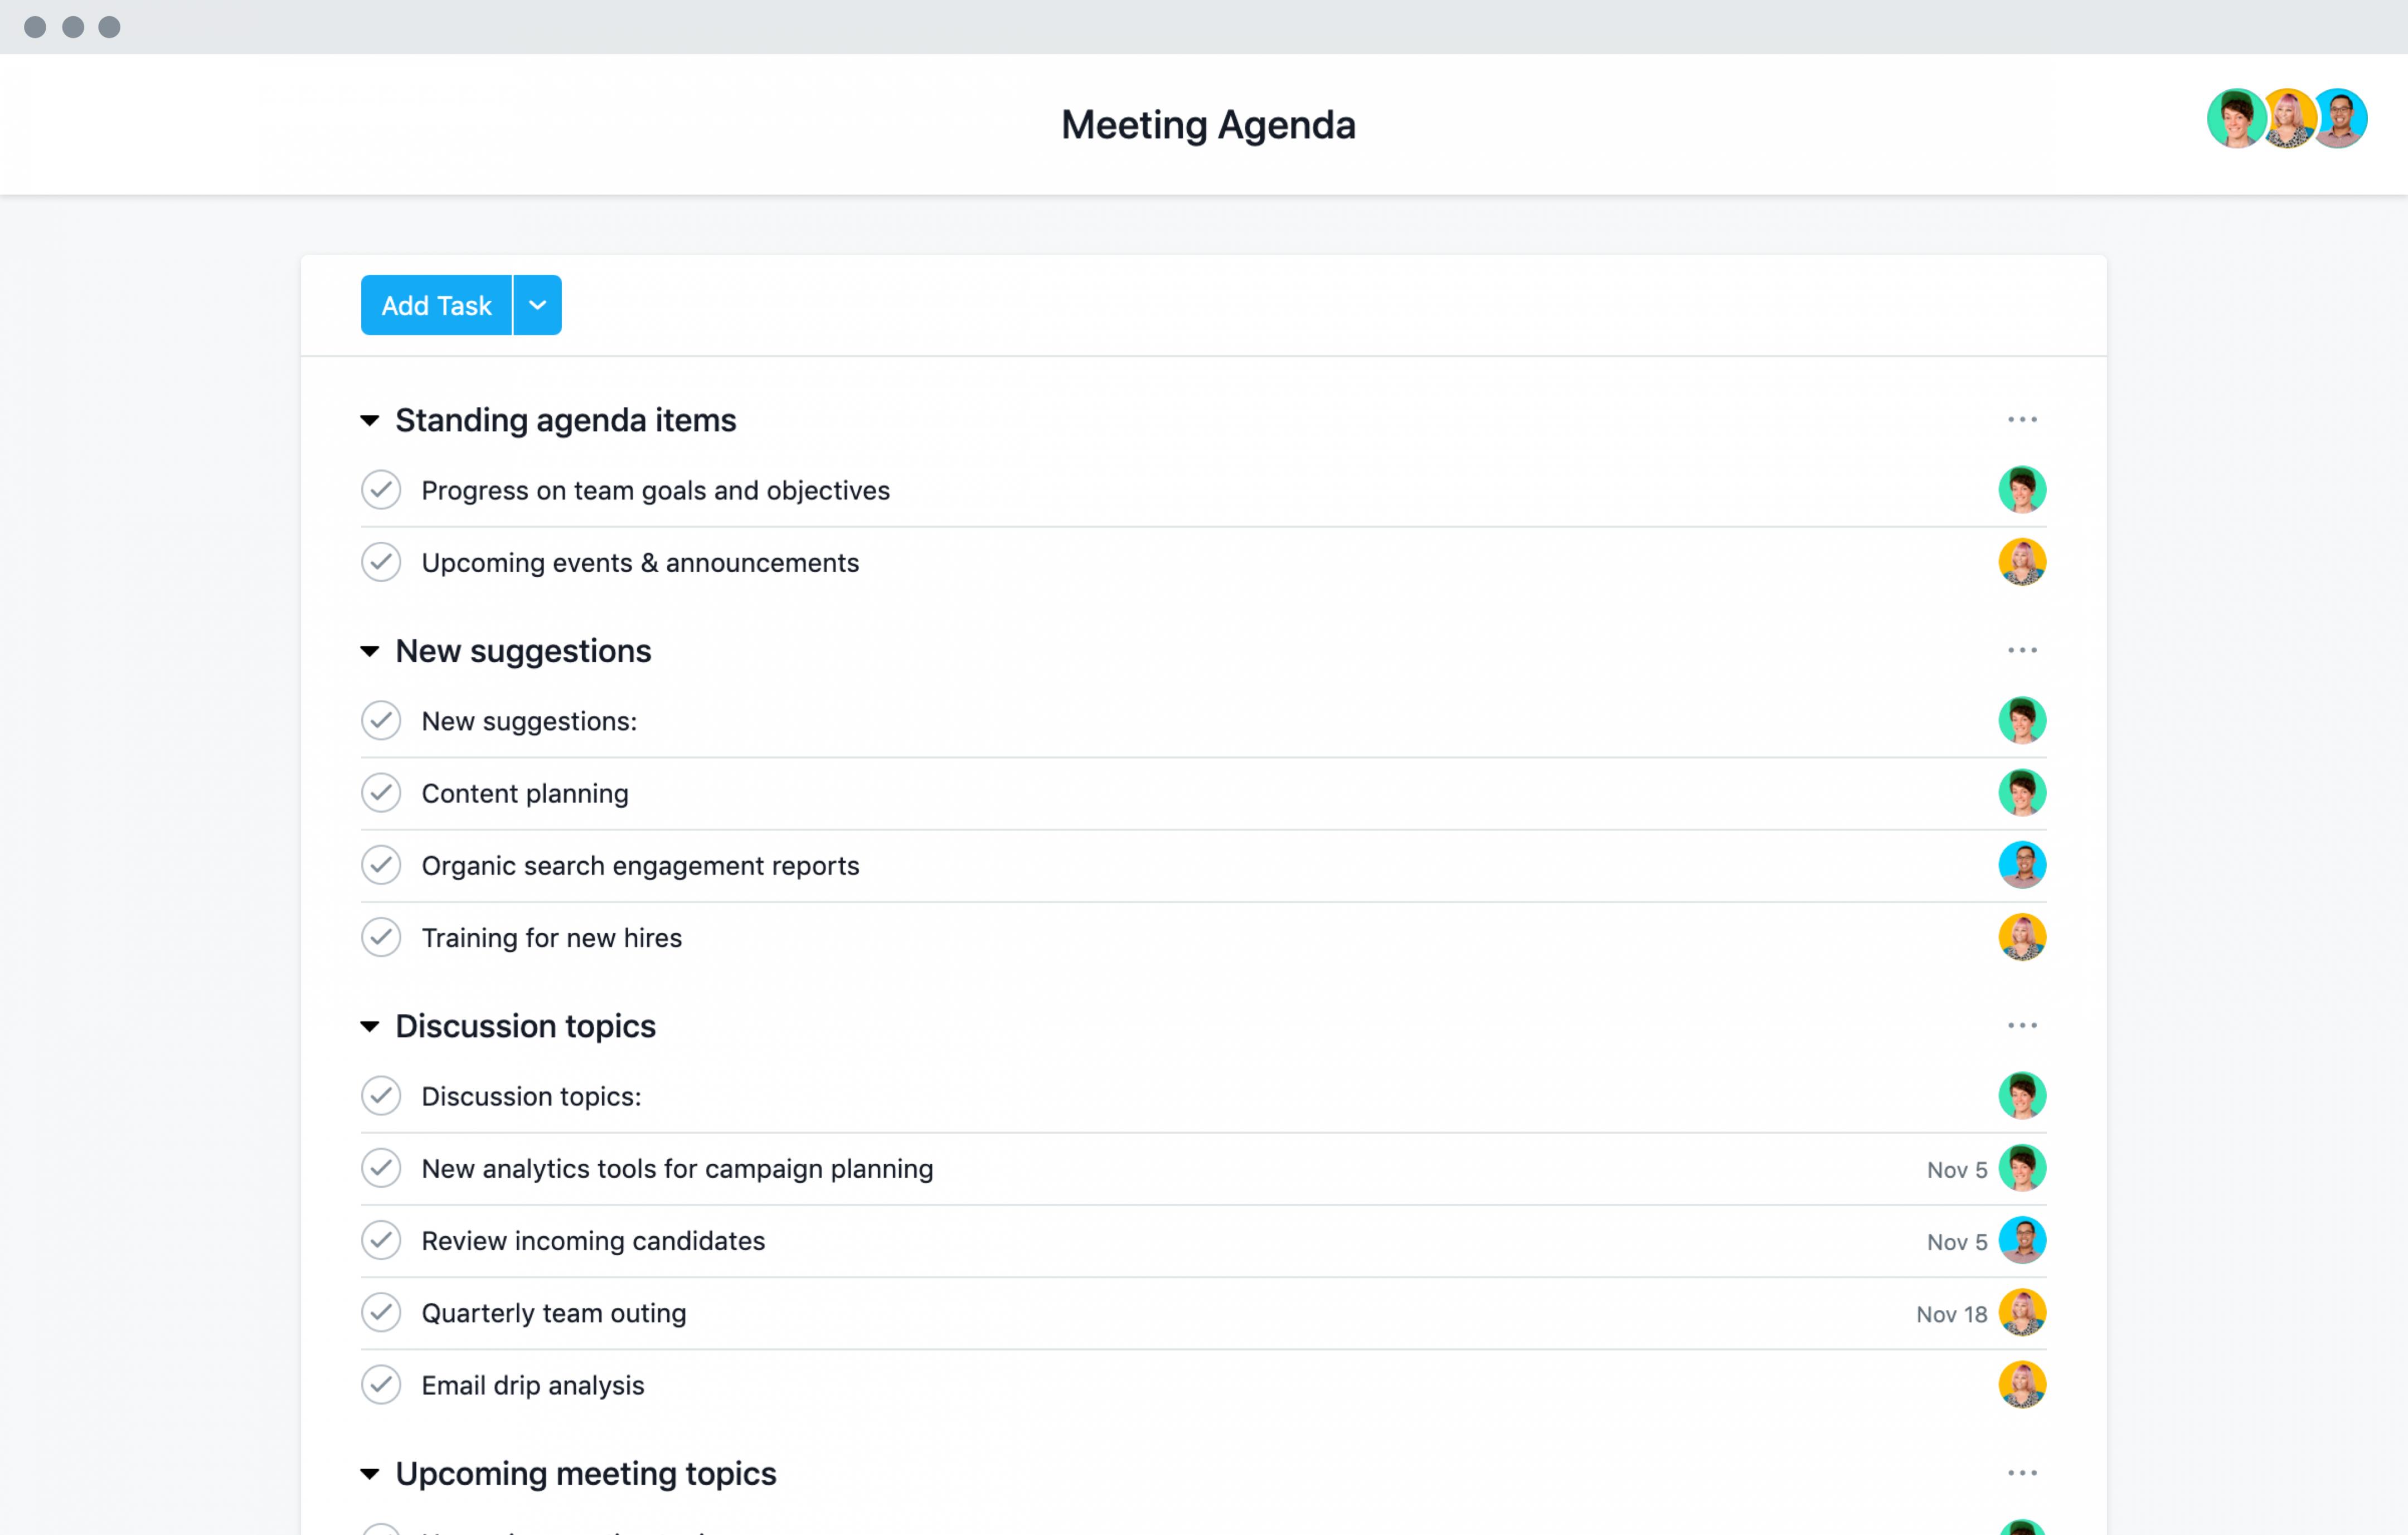 Editable Easy To Adapt Meeting Agenda Template · Asana Template For An Agenda For A Meeting Sample